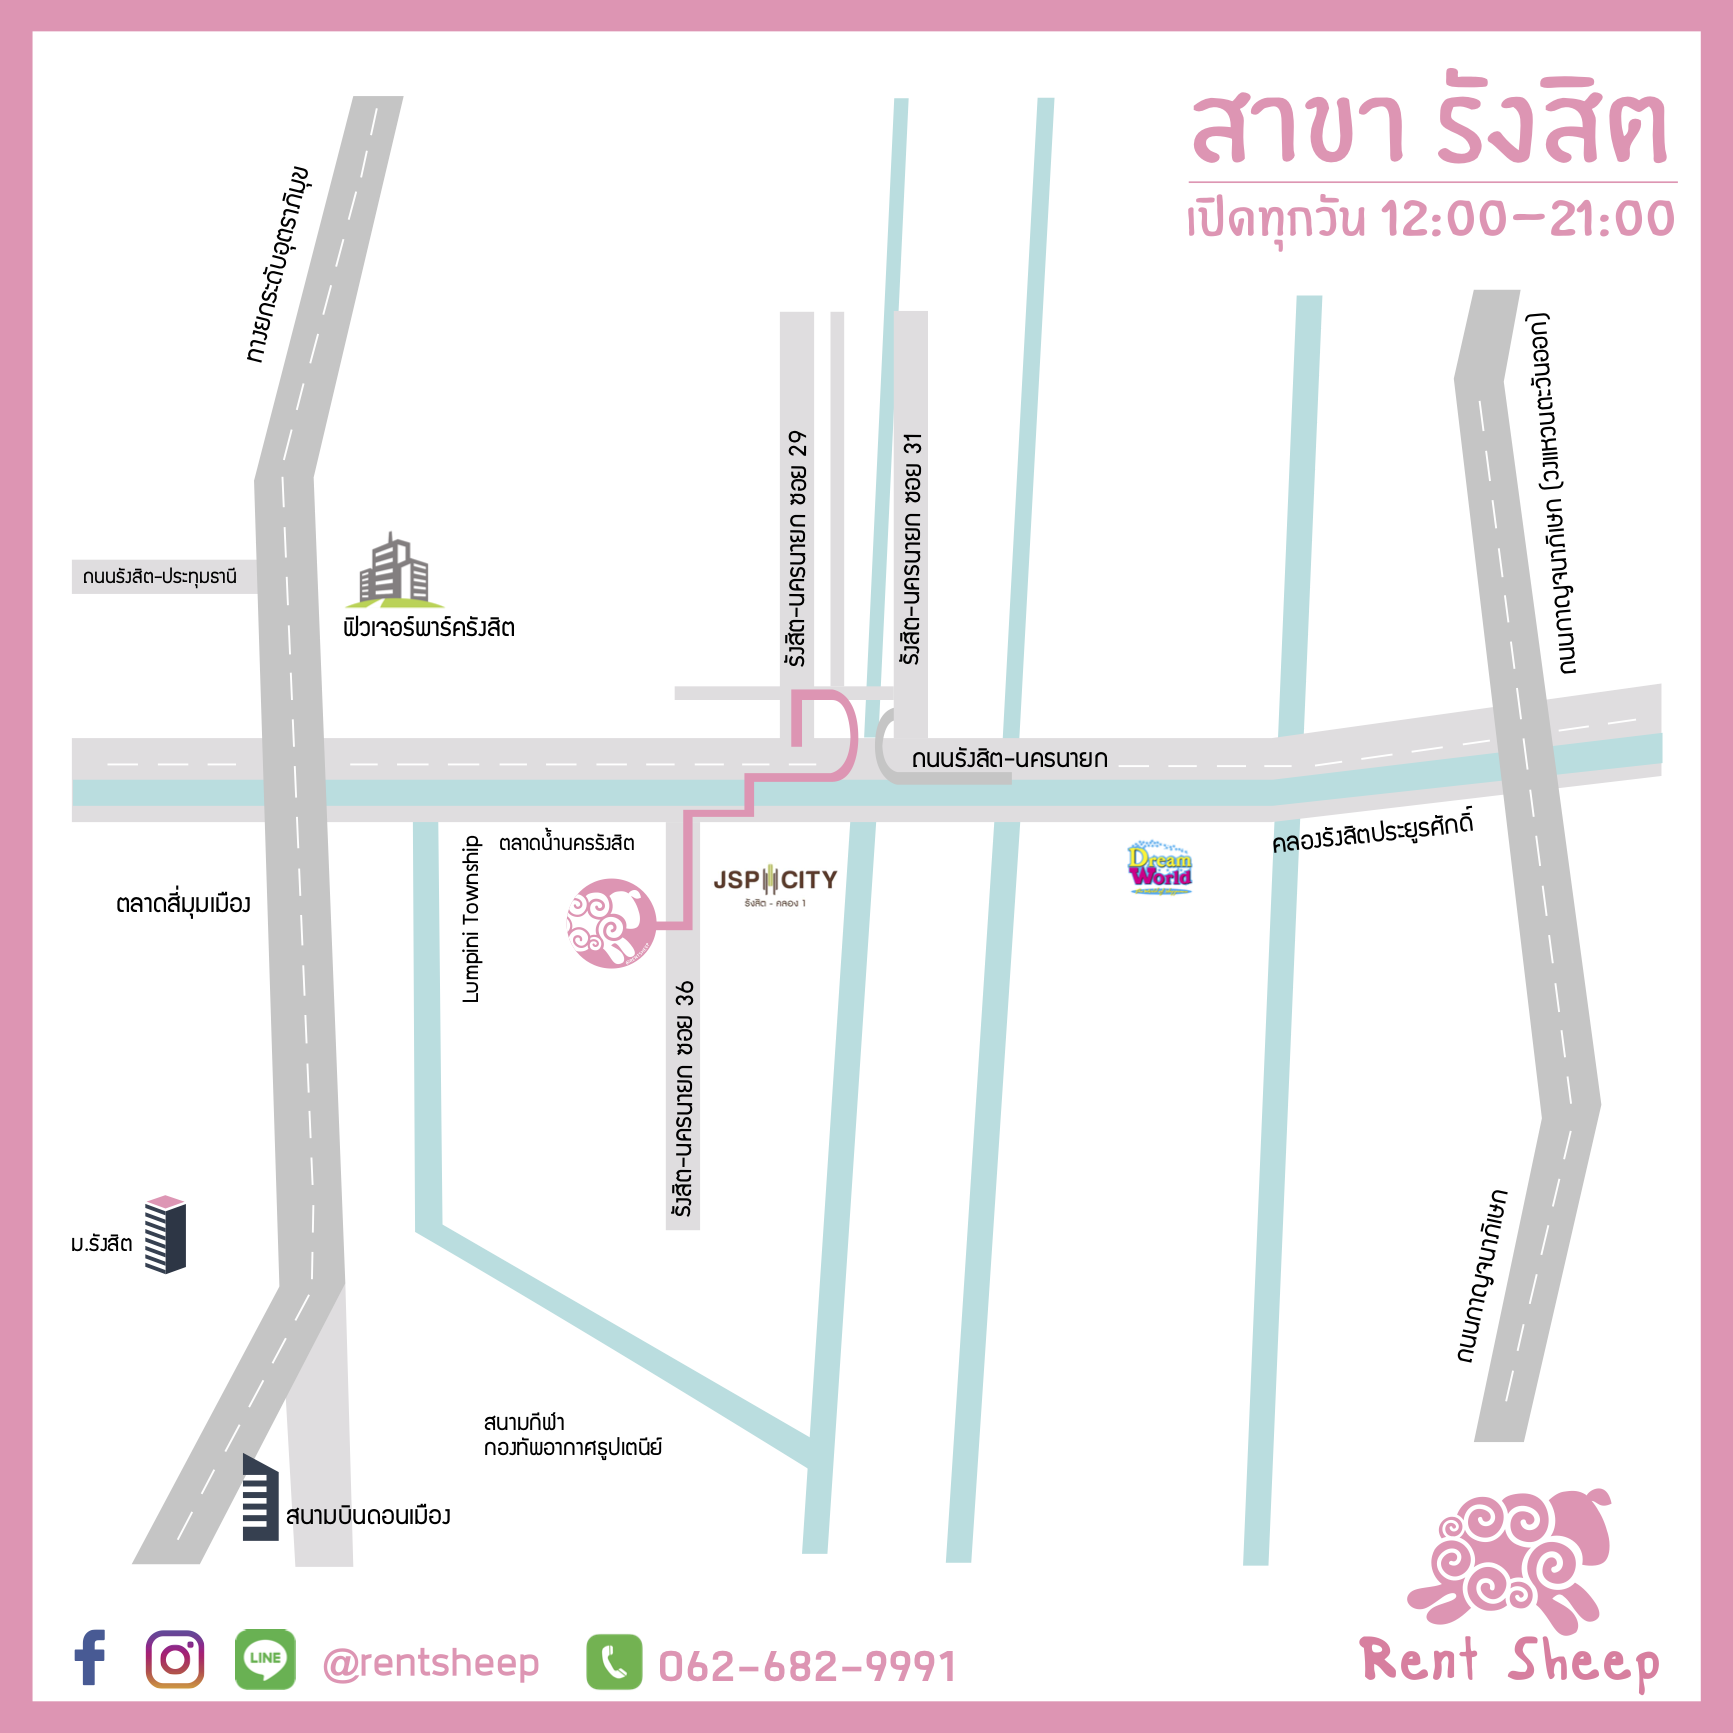 http://map-RS1-รังสิต-rentsheep